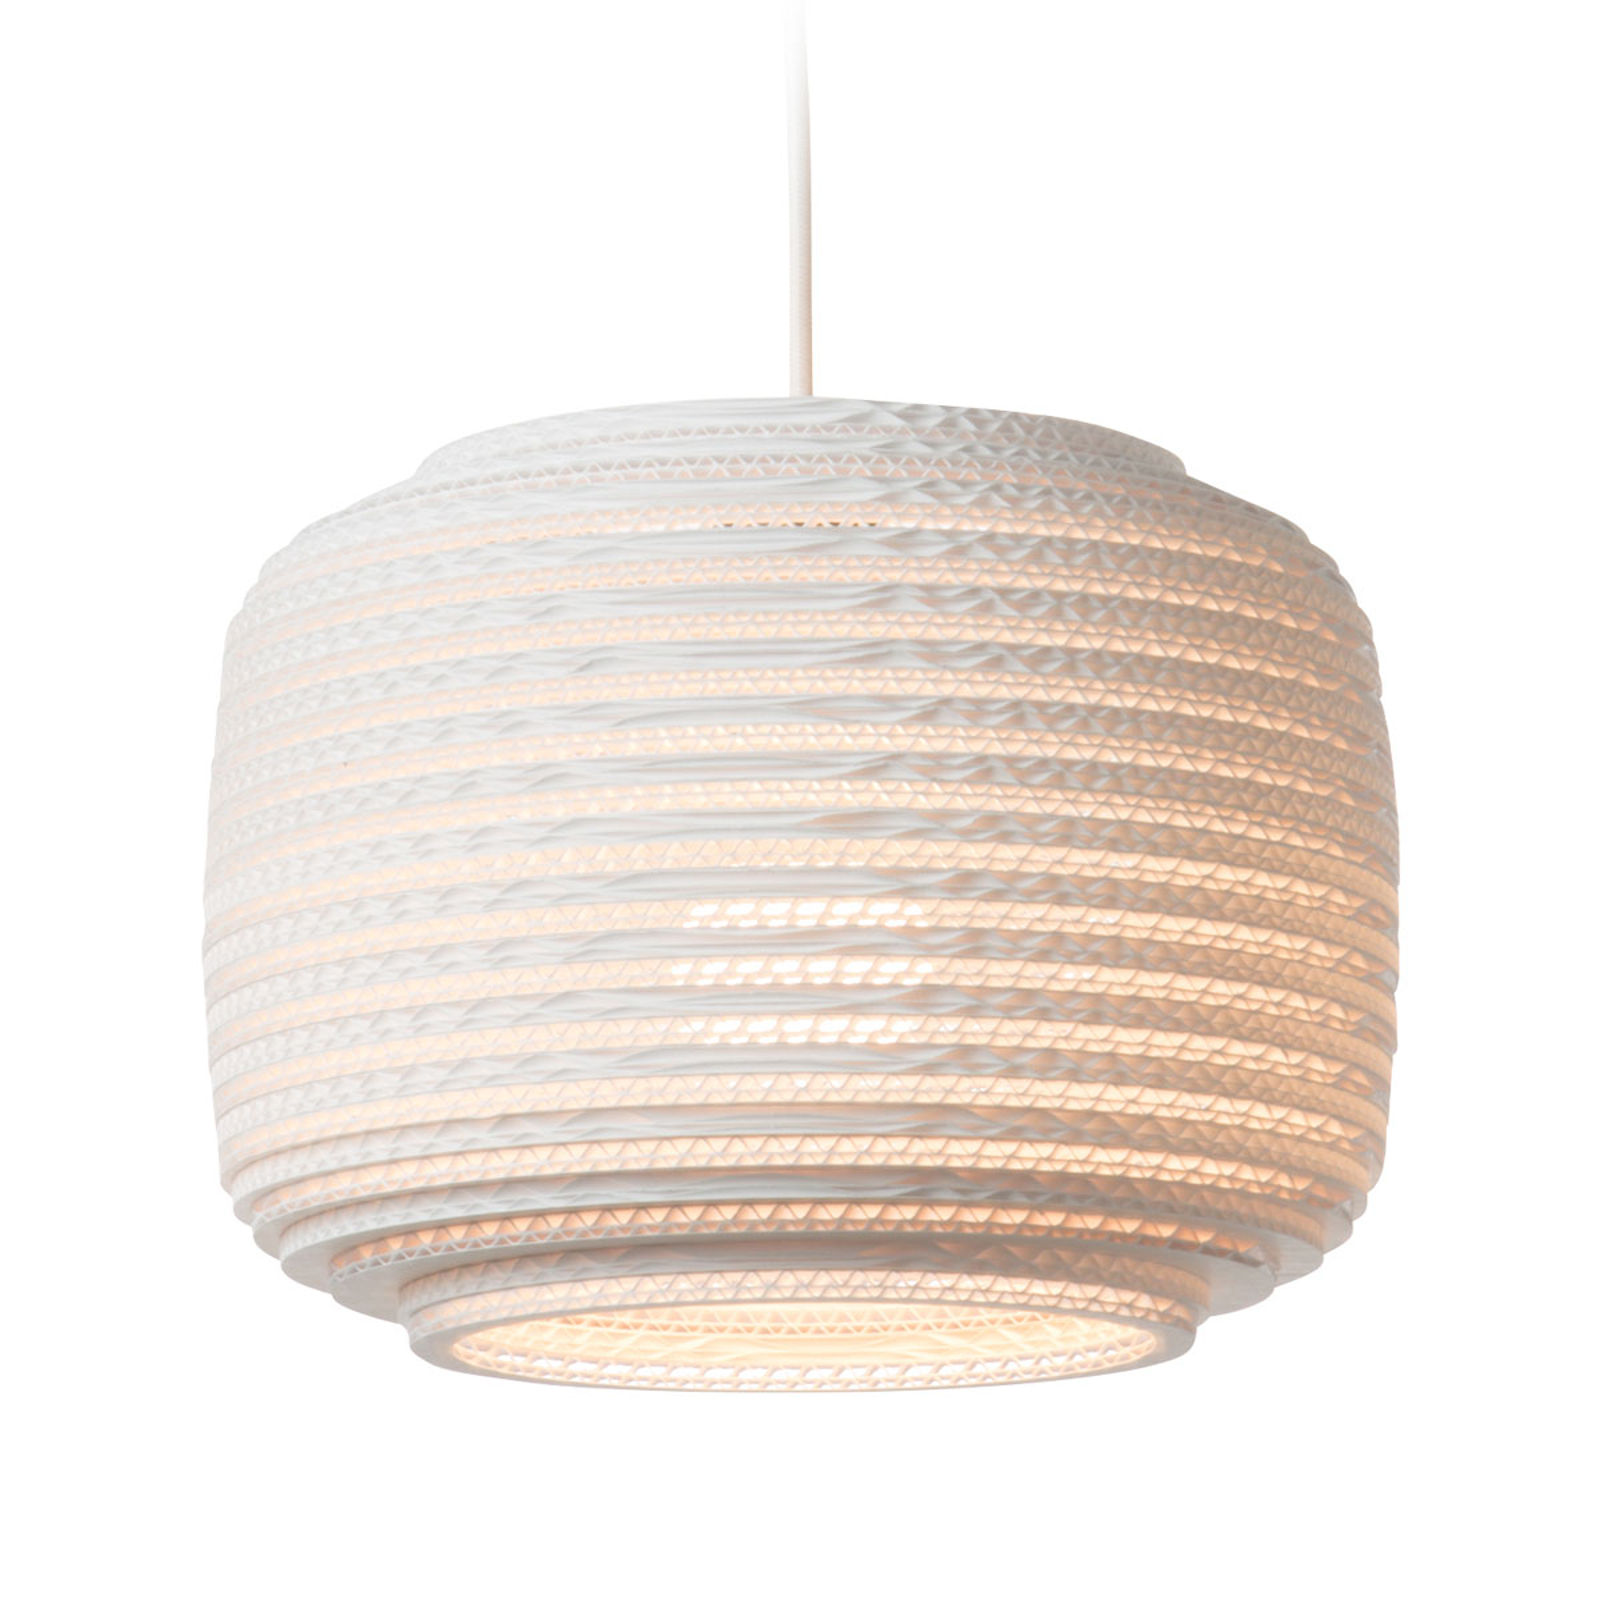 Lampa wisząca Ausi12